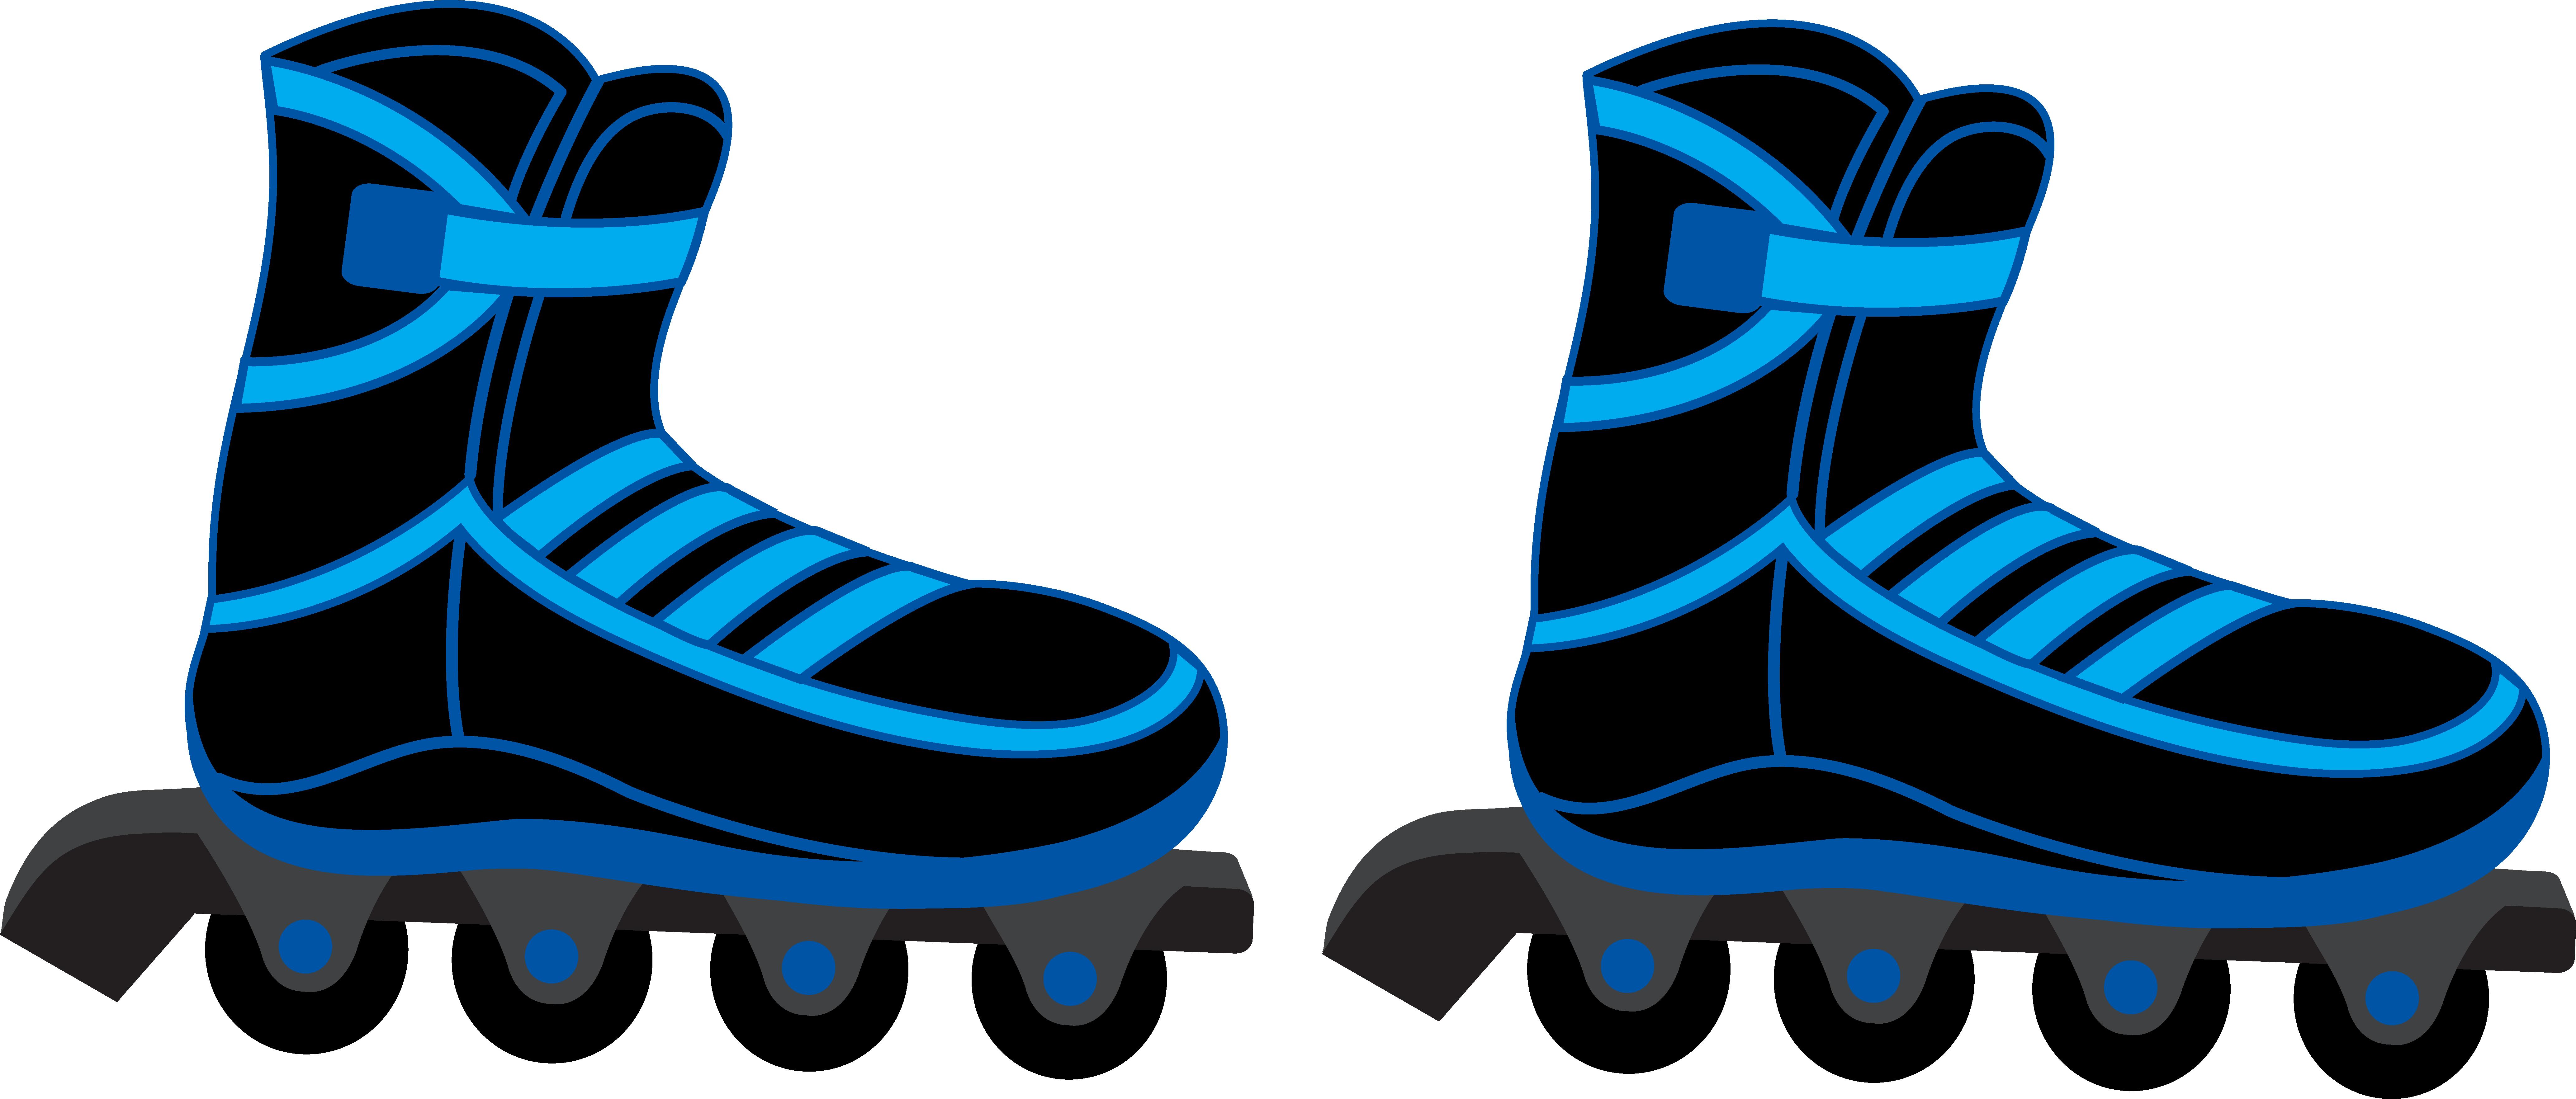 8272x3530 Blur Clipart Roller Skate